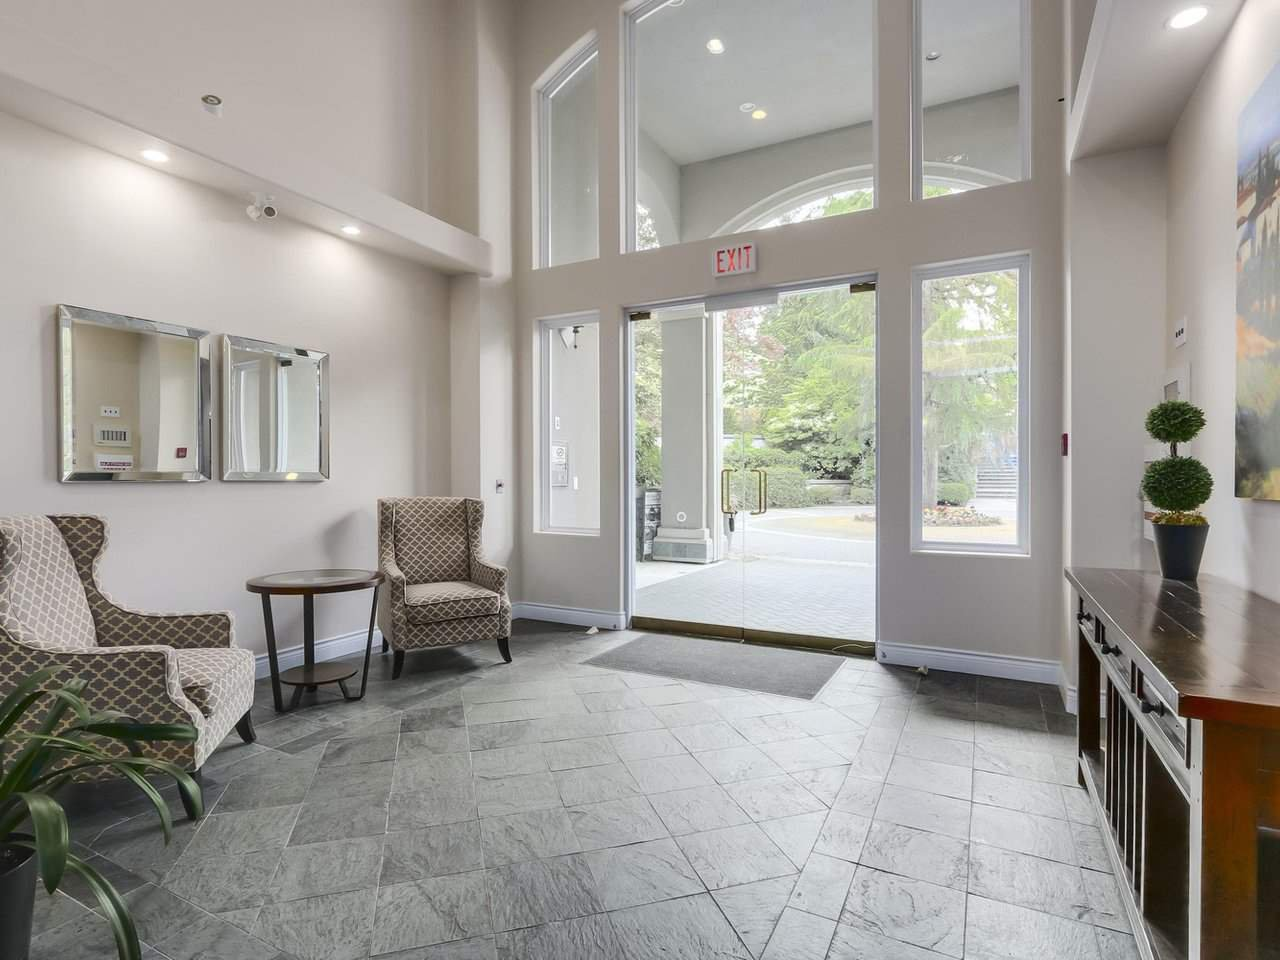 Photo 2: Photos: 303 3280 PLATEAU BOULEVARD in Coquitlam: Westwood Plateau Condo for sale : MLS®# R2275918